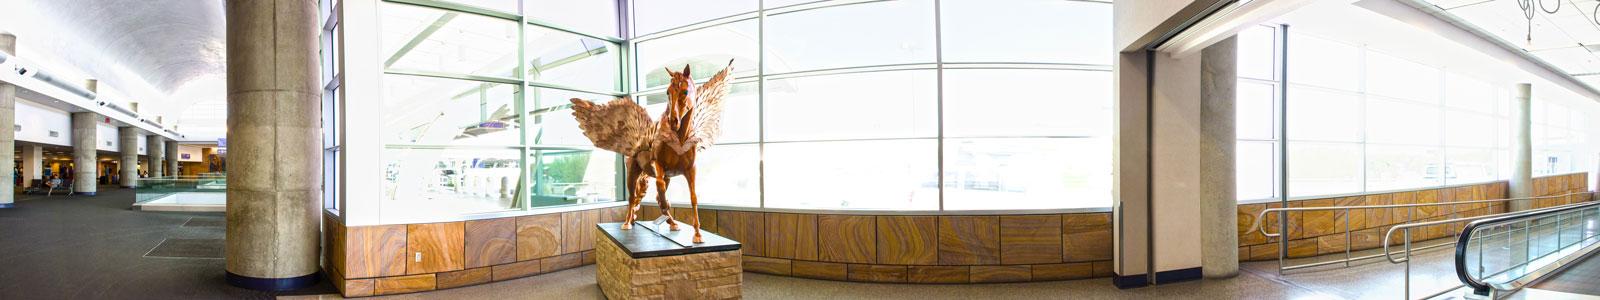 Pegasus Panorama